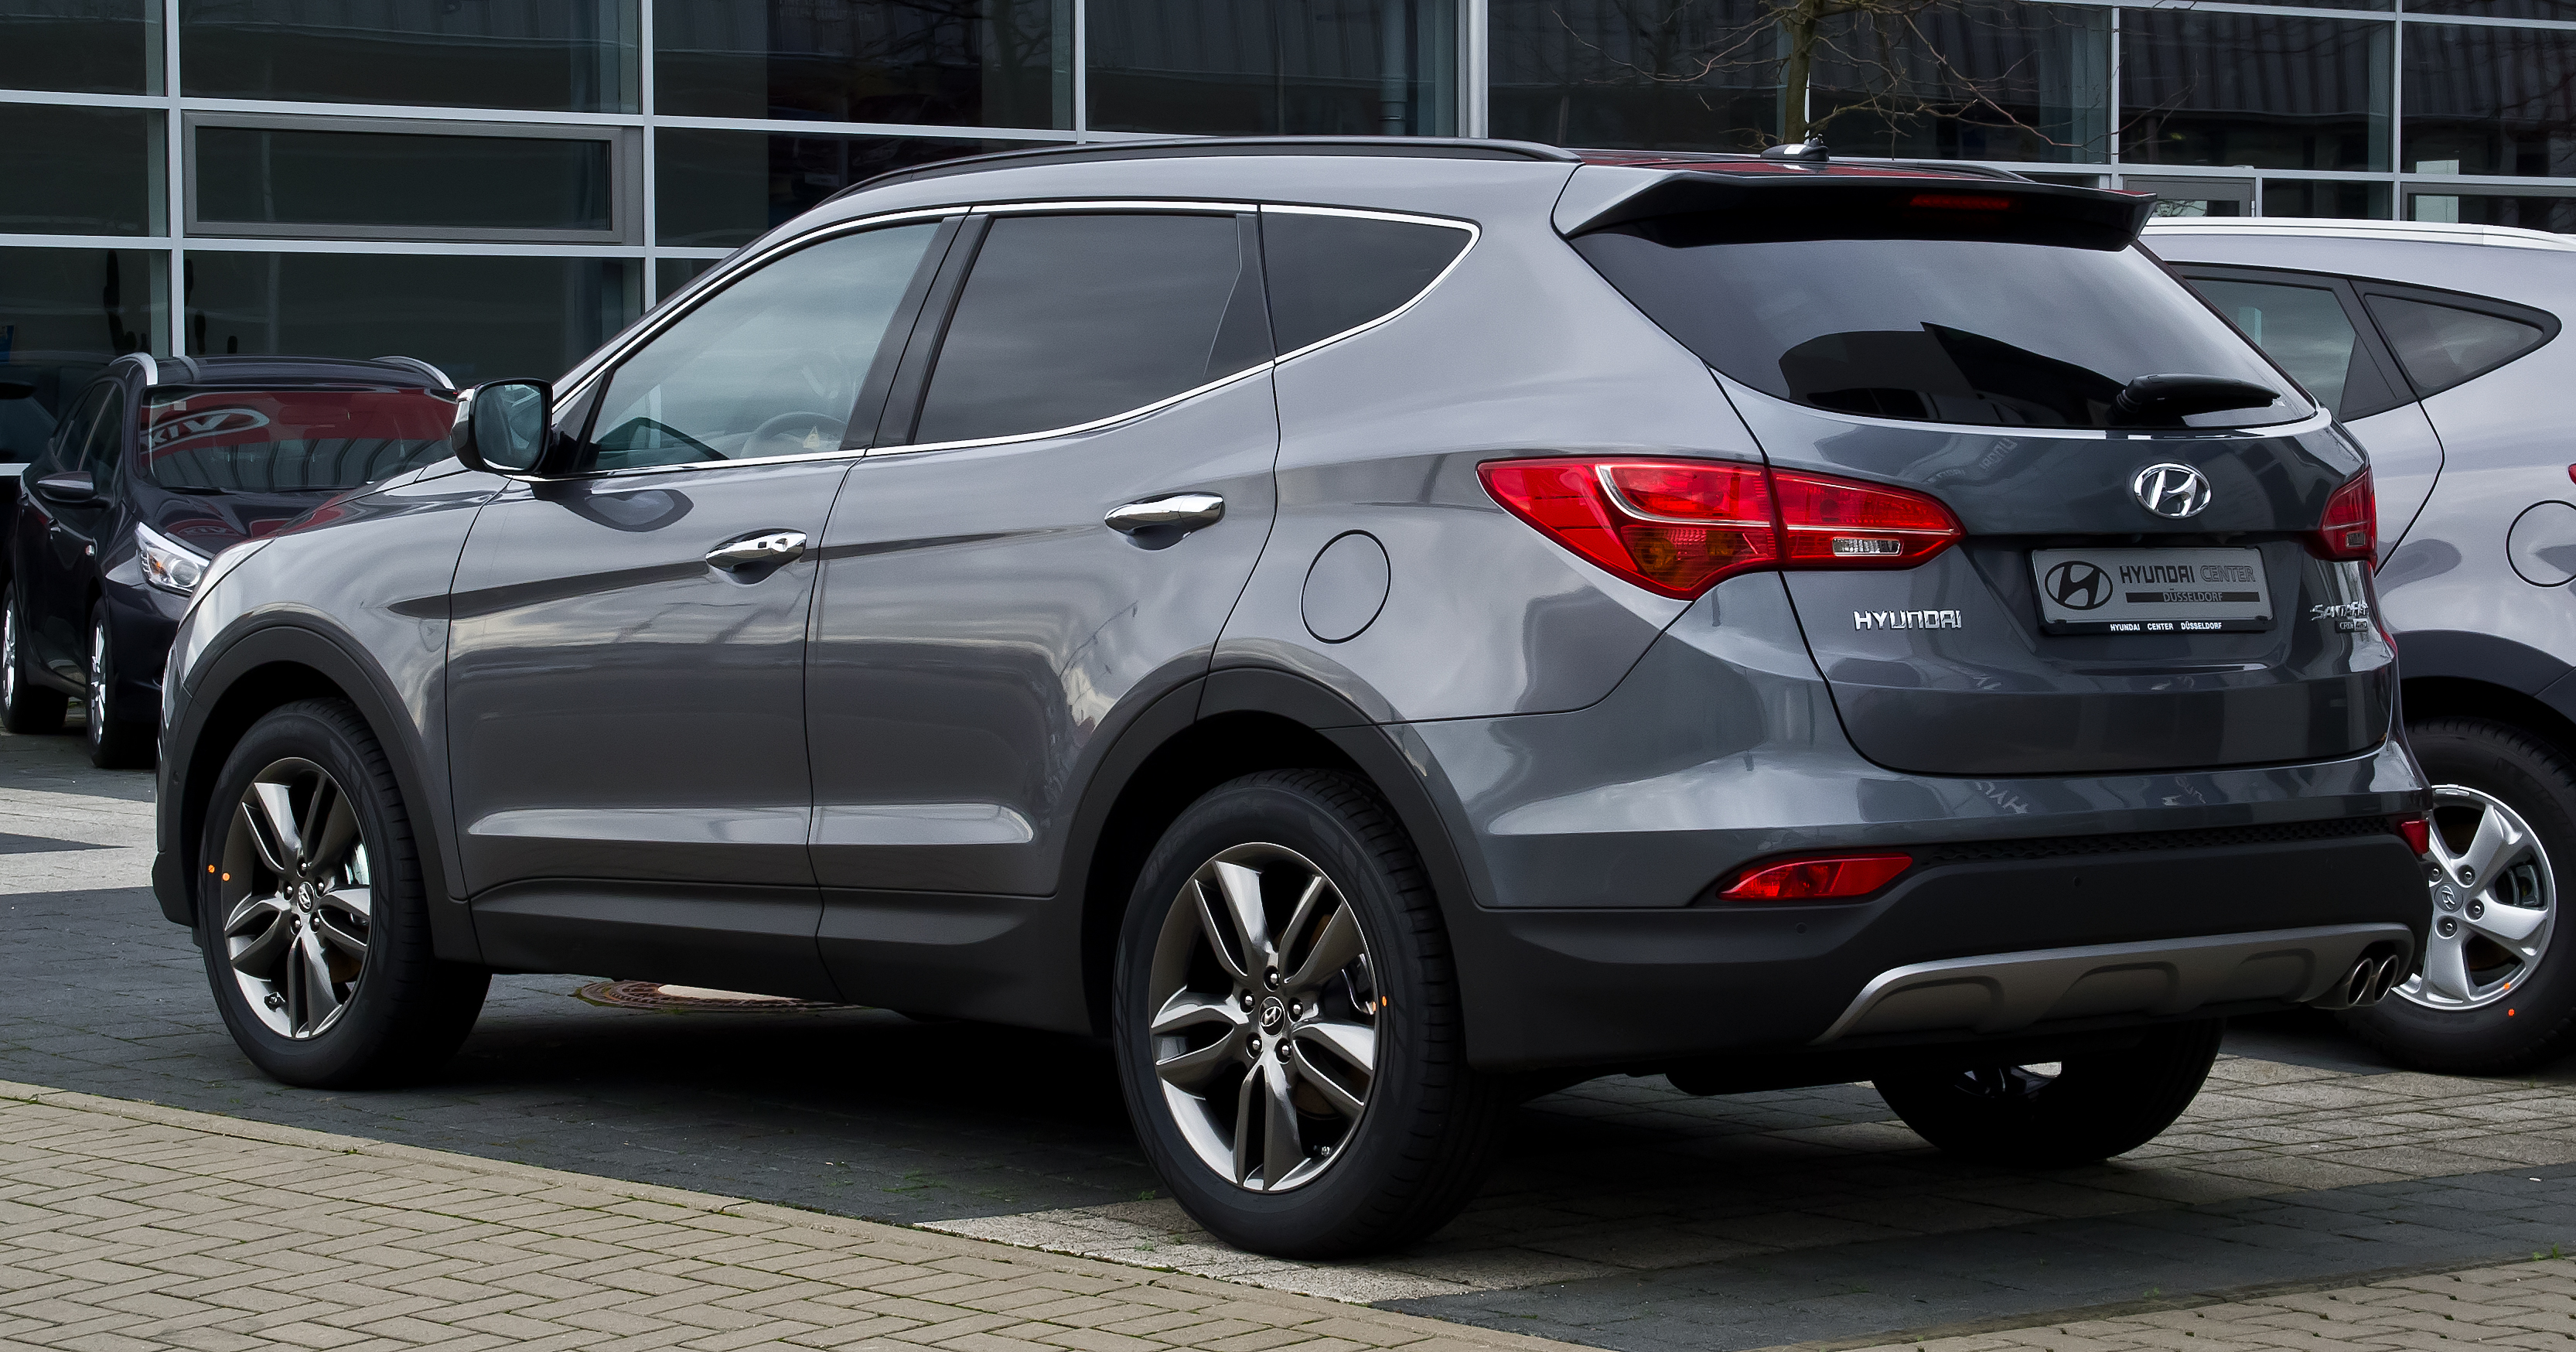 File:Hyundai Santa Fe 2.2 CRDi 4WD Premium (III) – Heckansicht, 31